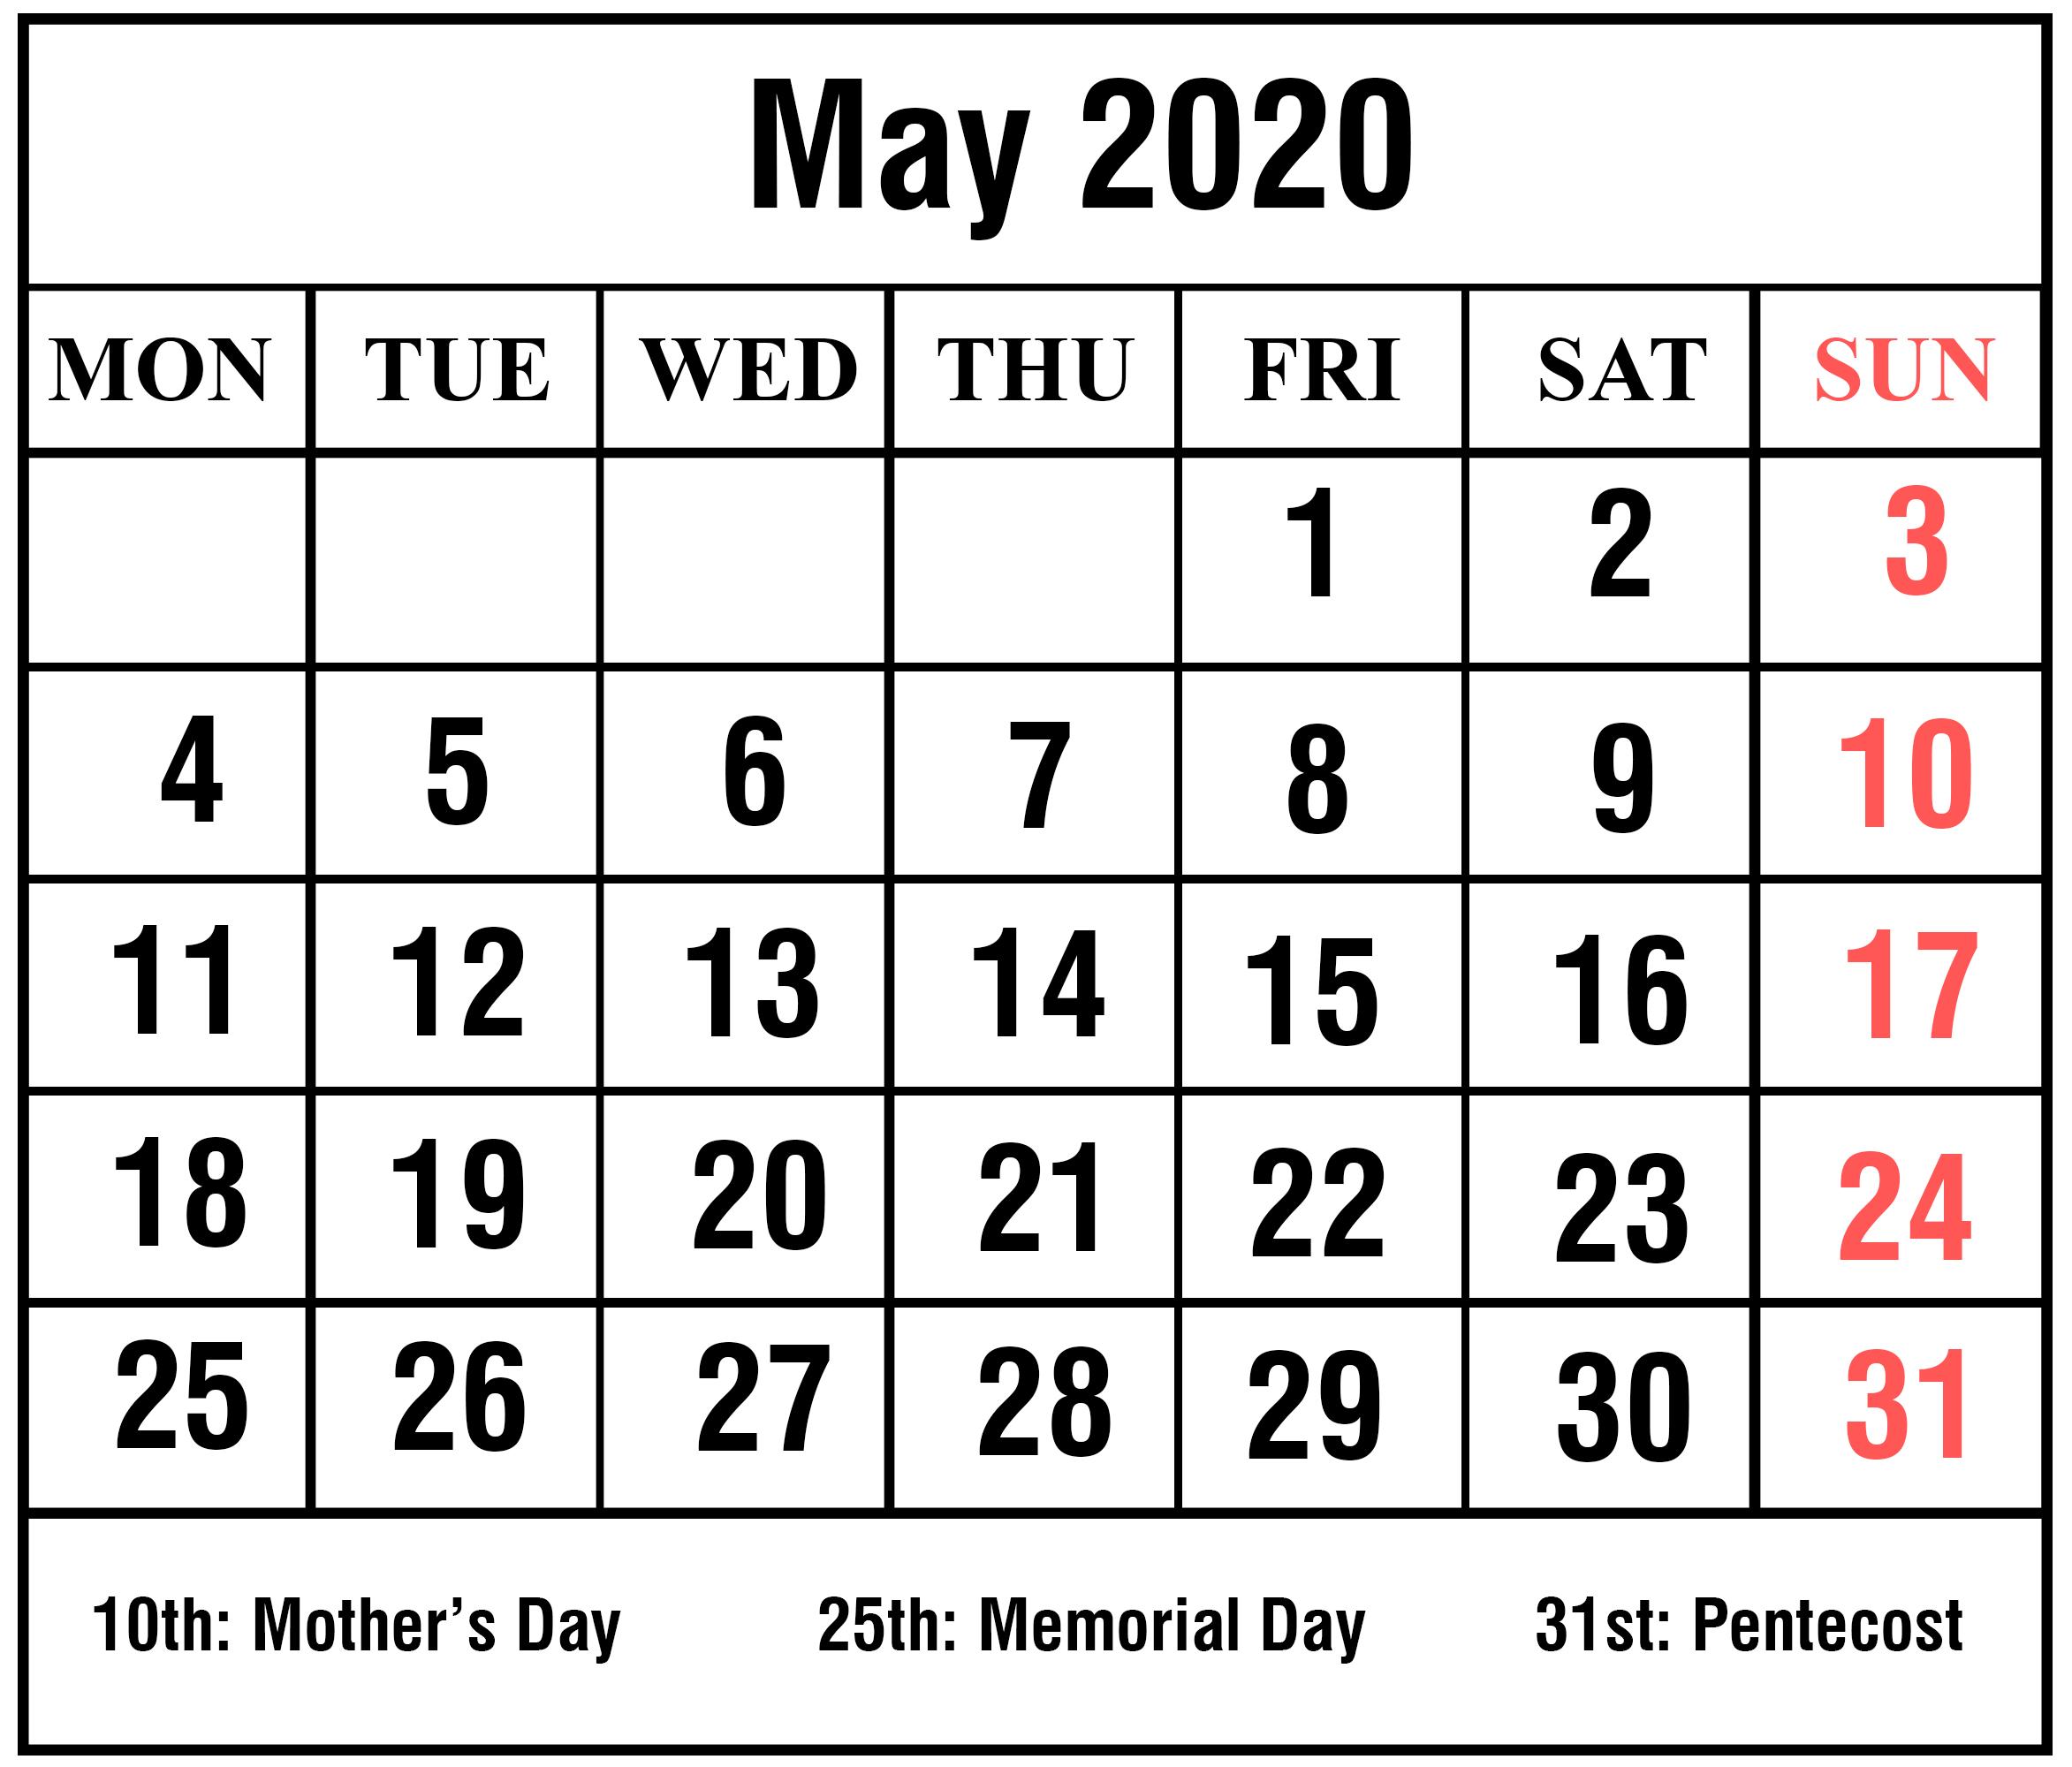 may 2020 calendar printable pdf